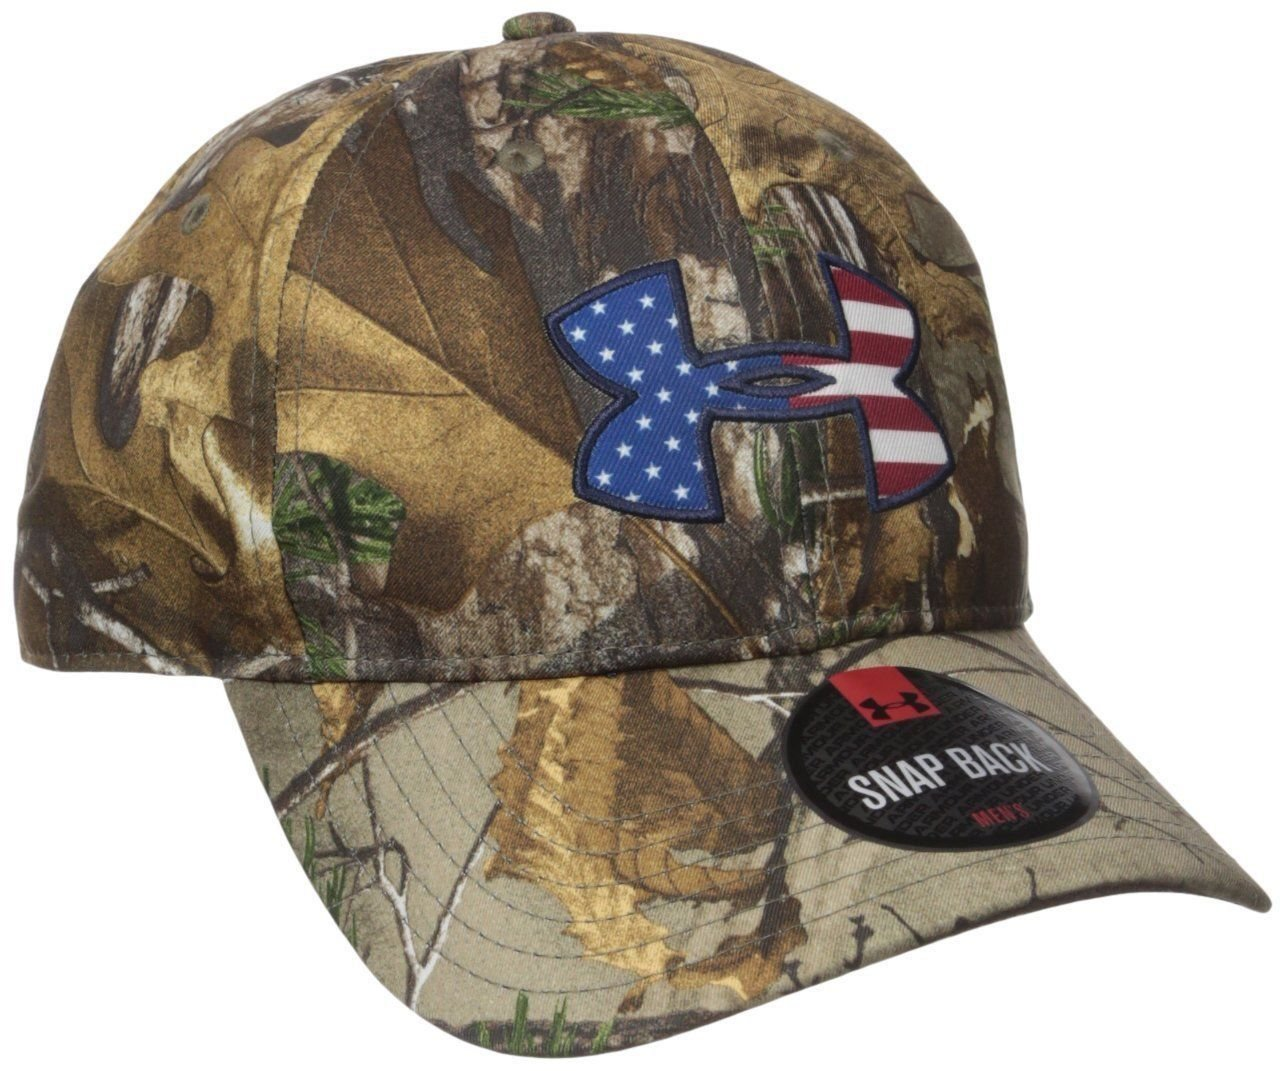 Under Armour Men's Realtree Ap-Xtra/Americana UA Big Logo 2.0 Camo Cap 14541